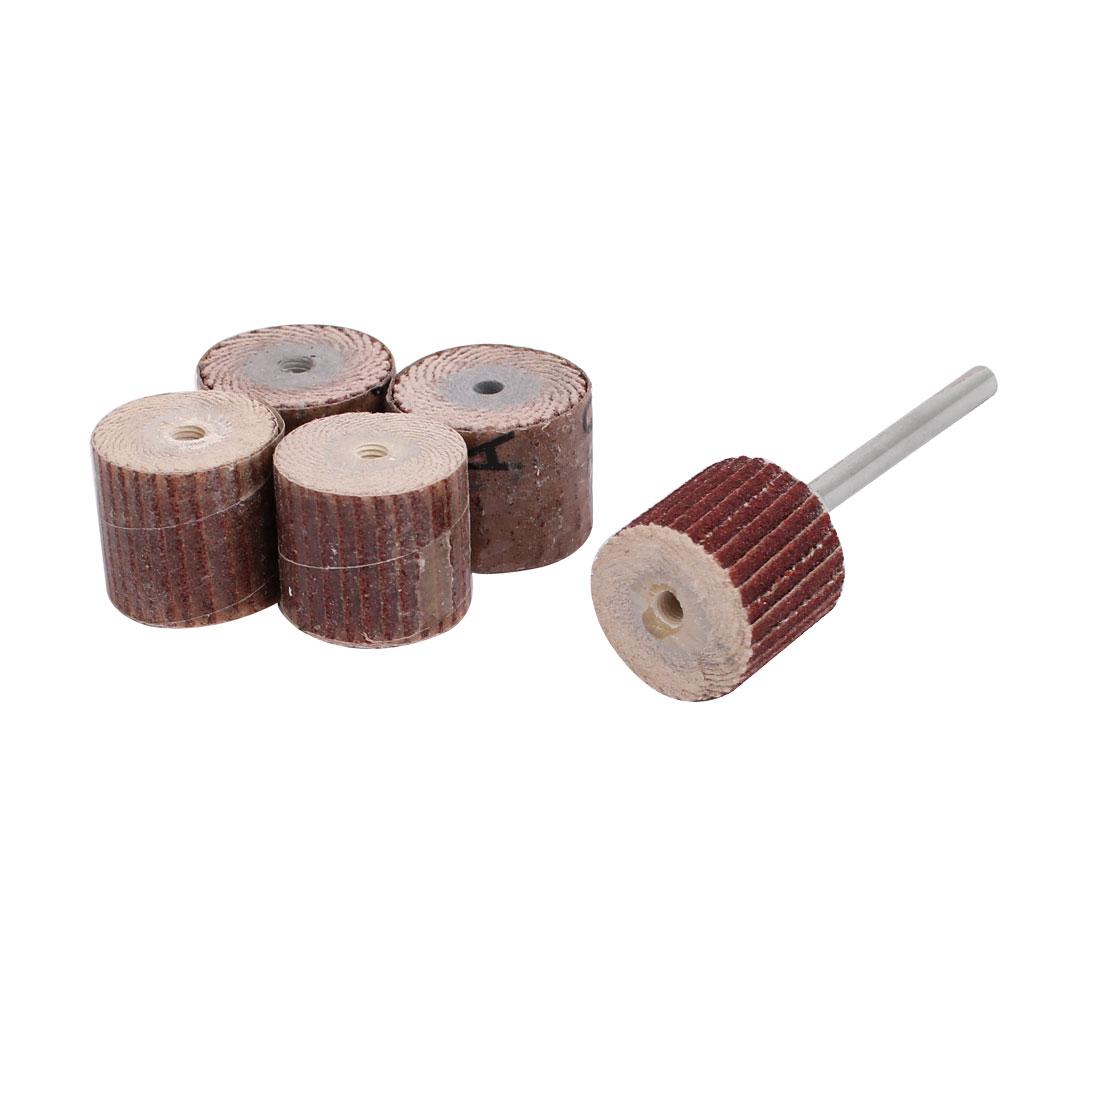 5pcs 15mm Dia 120 Grit Sandpaper Flap Sanding Wheel Grinding Head w Mandrel